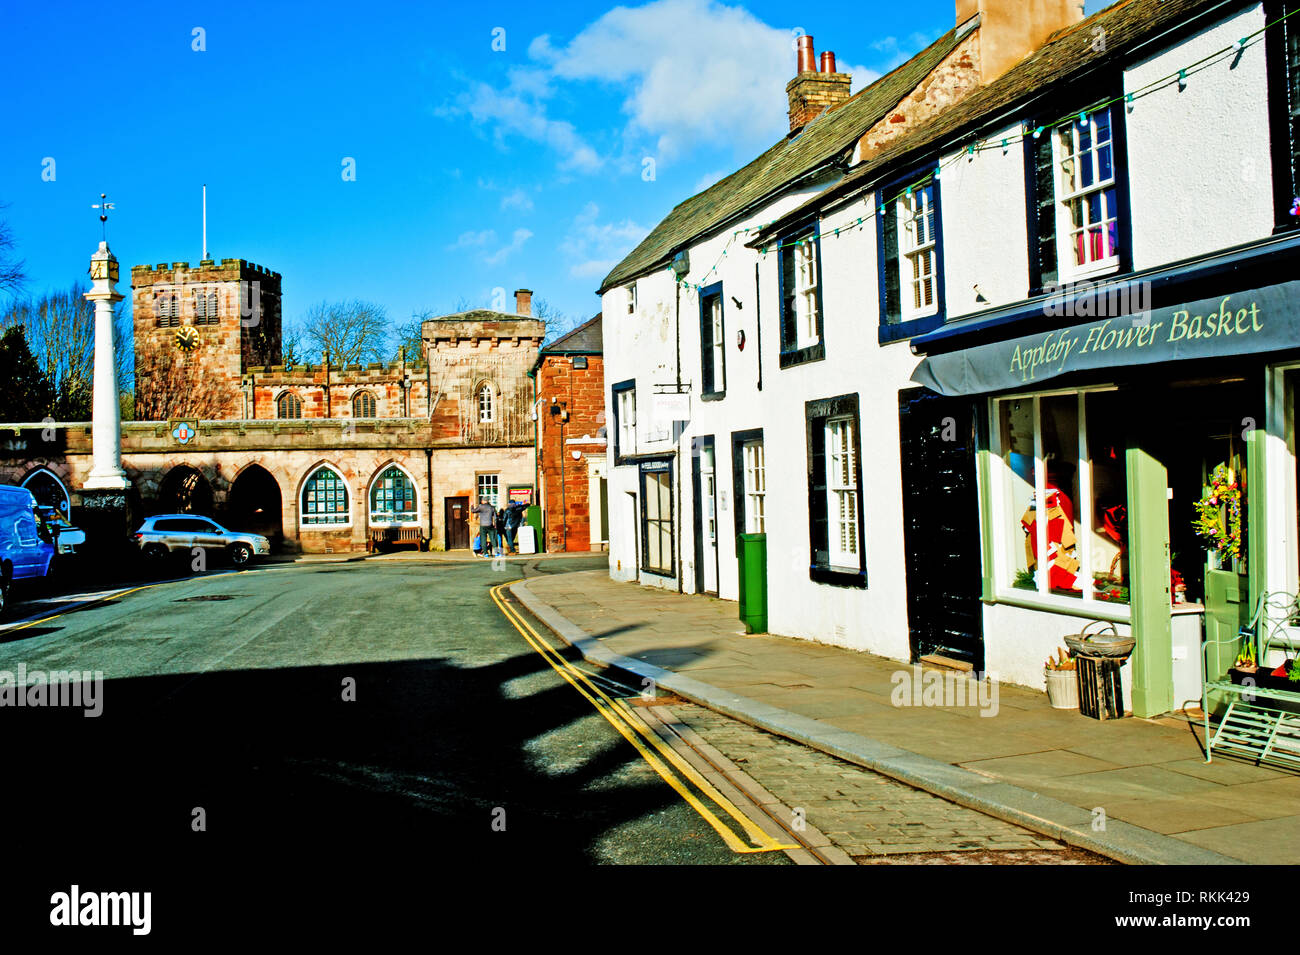 Appleby in Westmorland, Cumbria, England - Stock Image